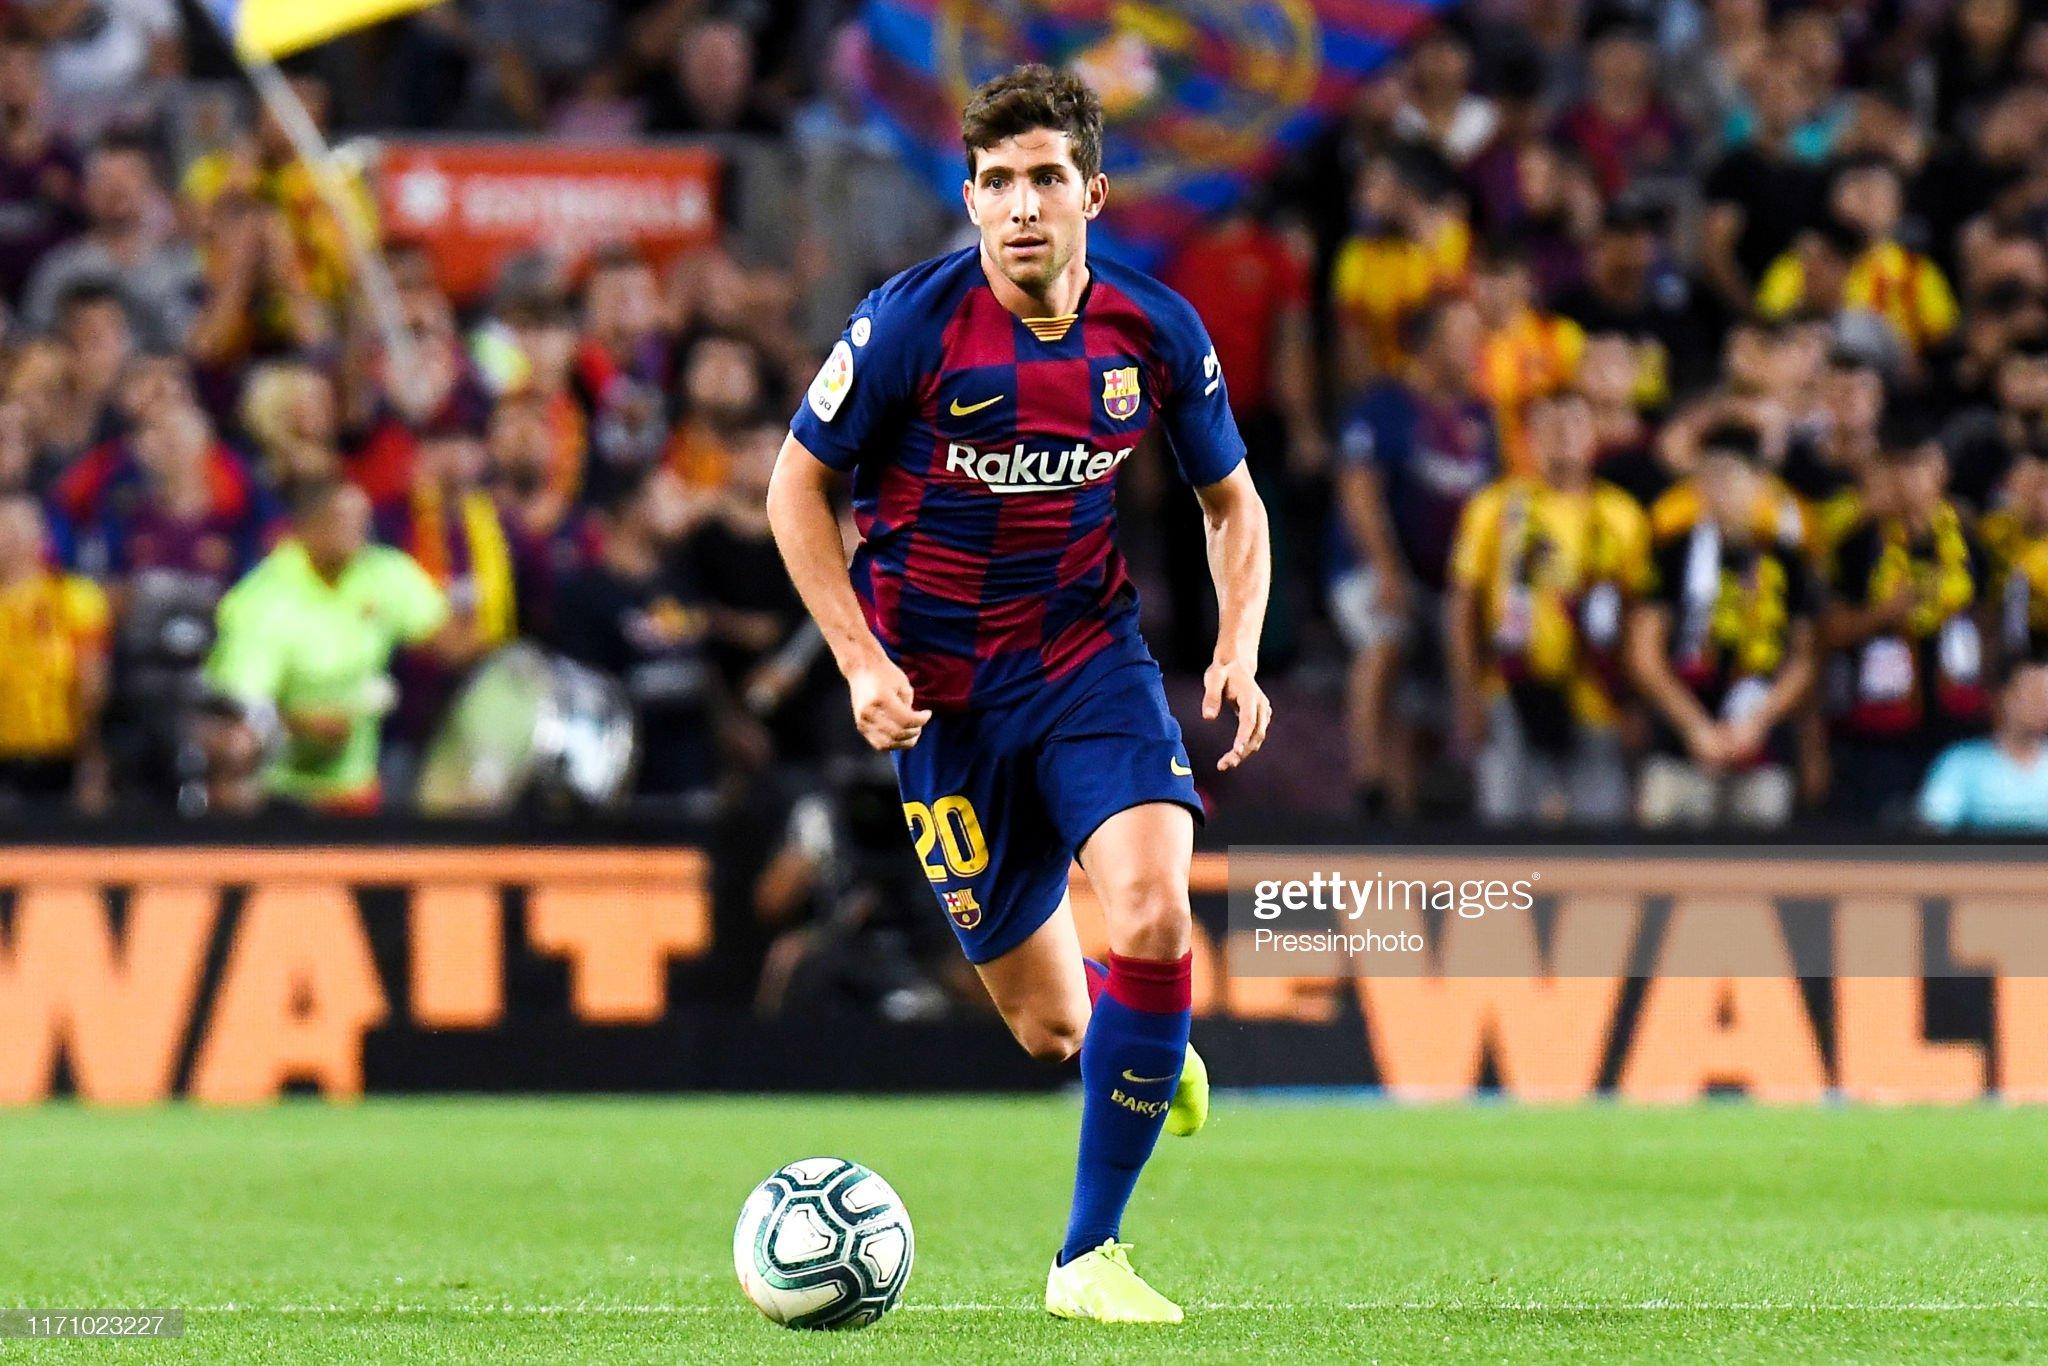 صور مباراة : برشلونة - فياريال 2-1 ( 24-09-2019 )  Sergi-roberto-of-fc-barcelona-during-the-liga-match-between-barcelona-picture-id1171023227?s=2048x2048